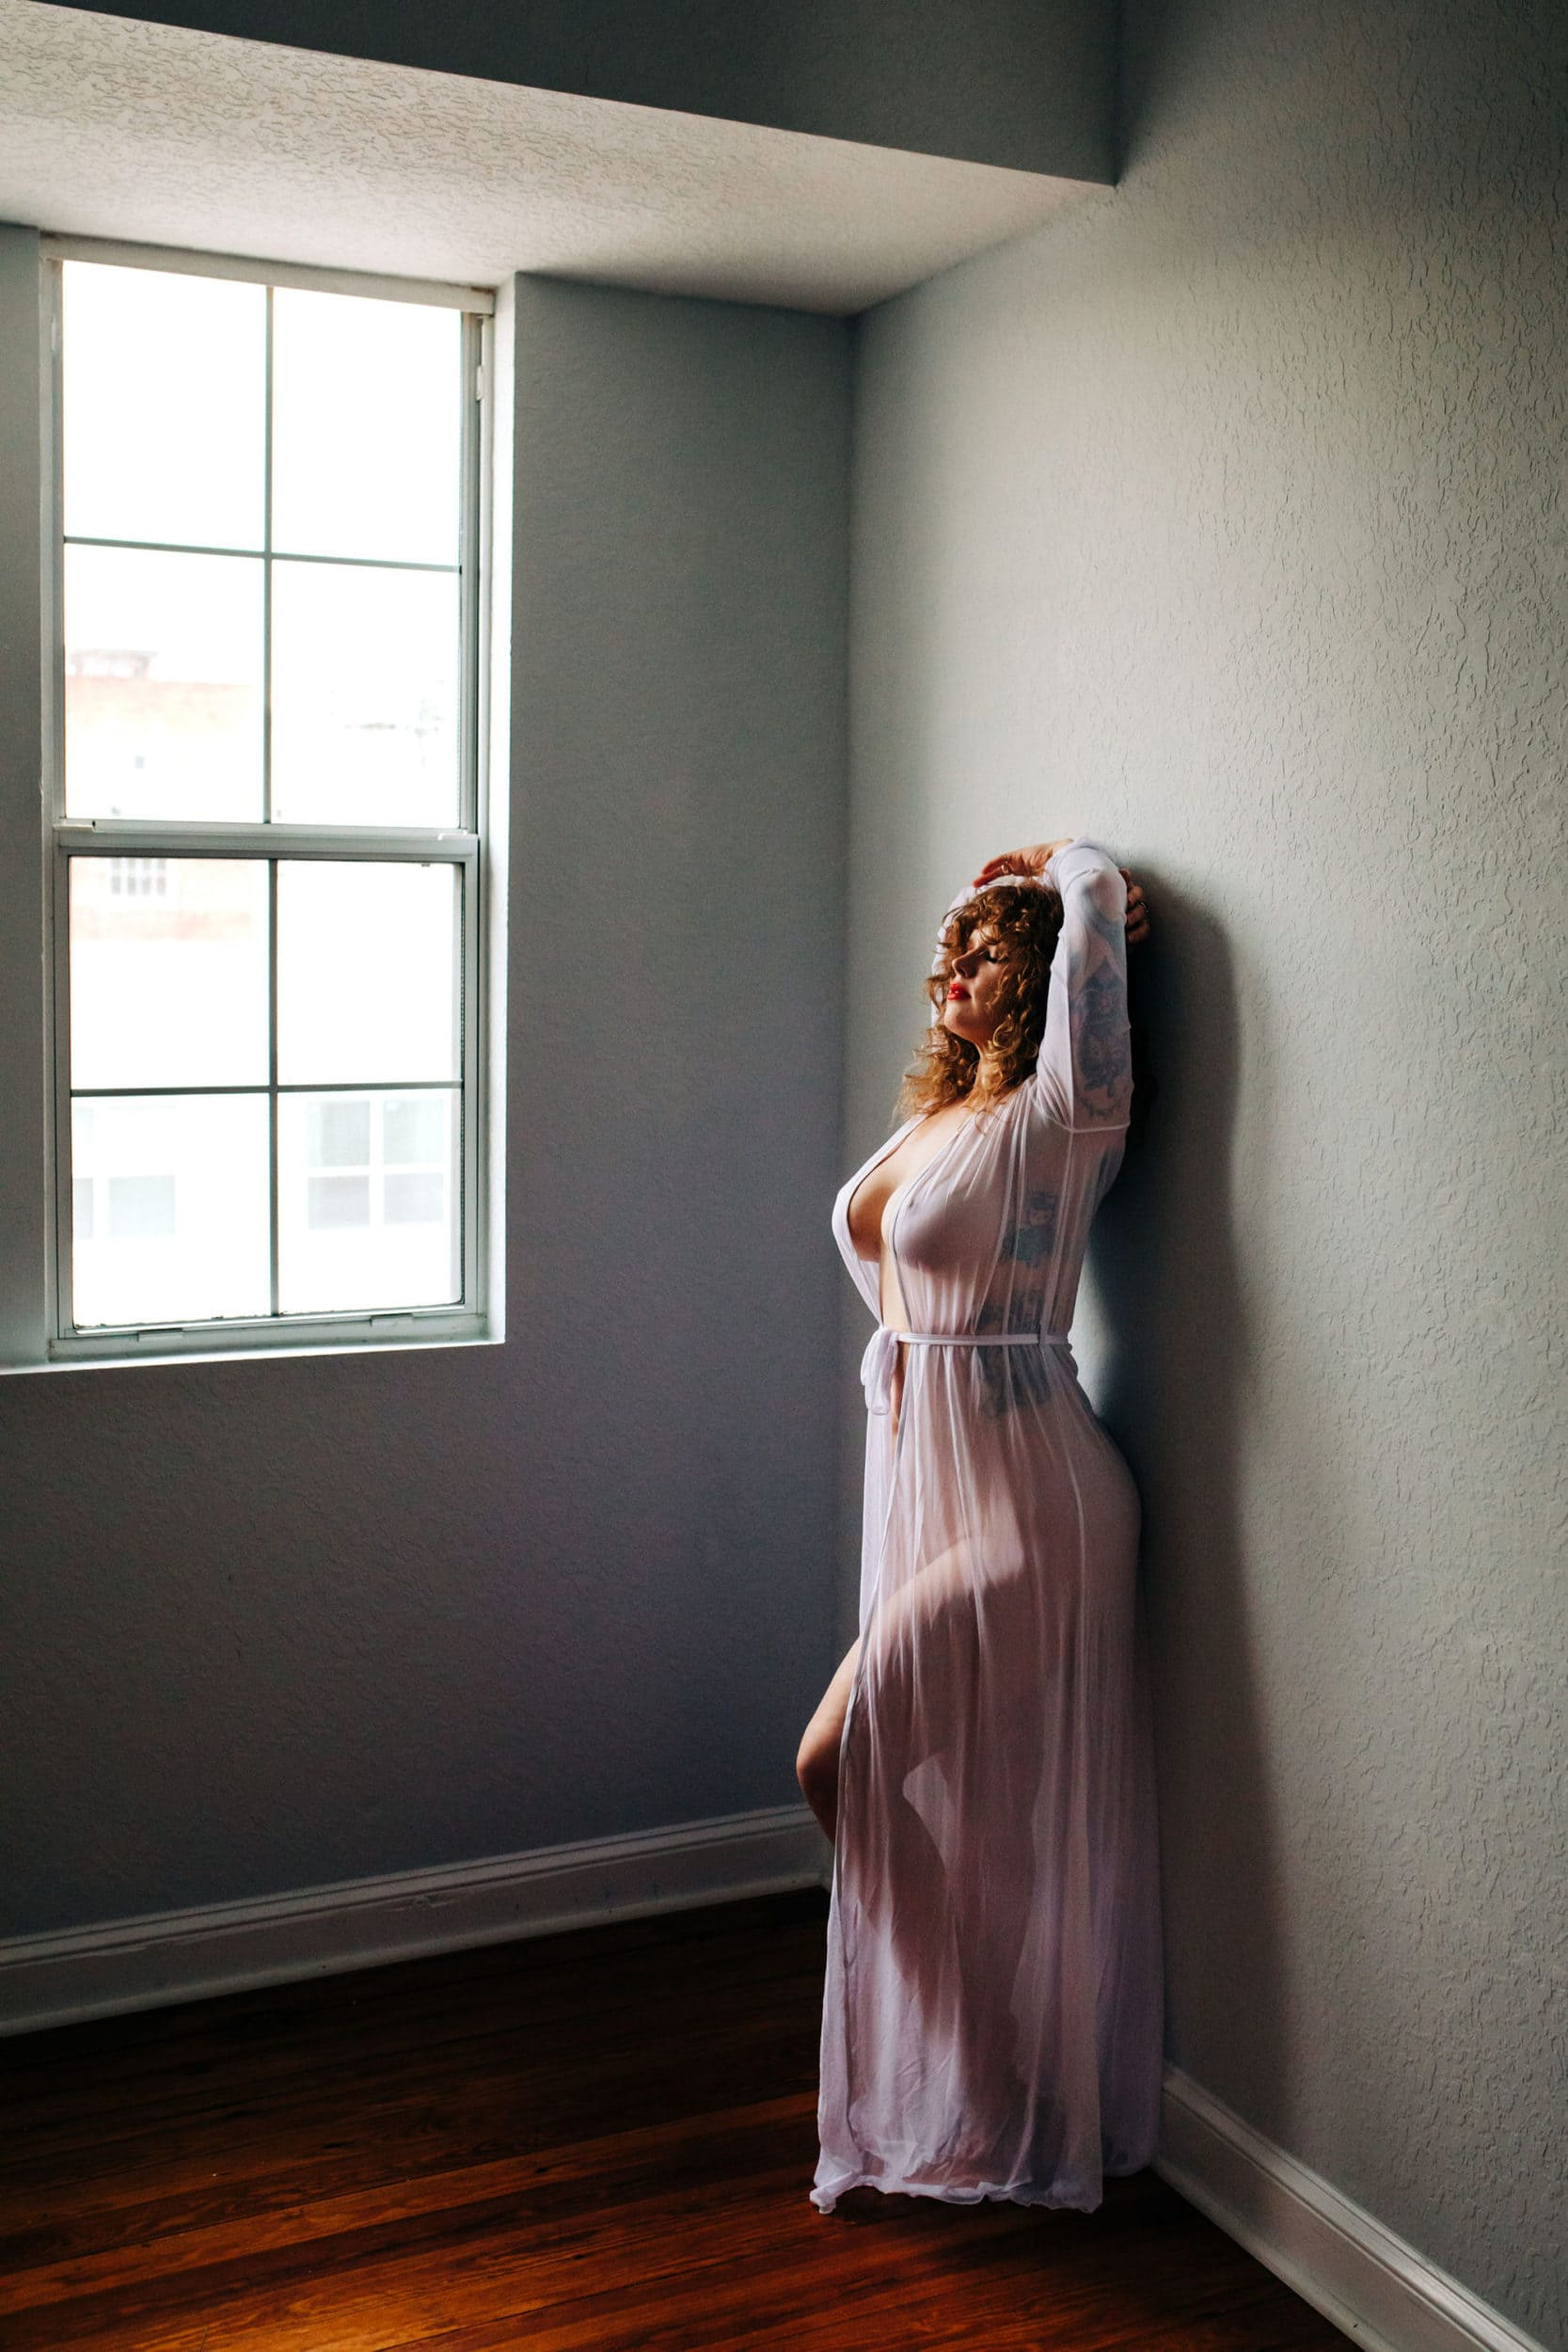 Redheaded girl standing in window light at Sara Ozim photography studio